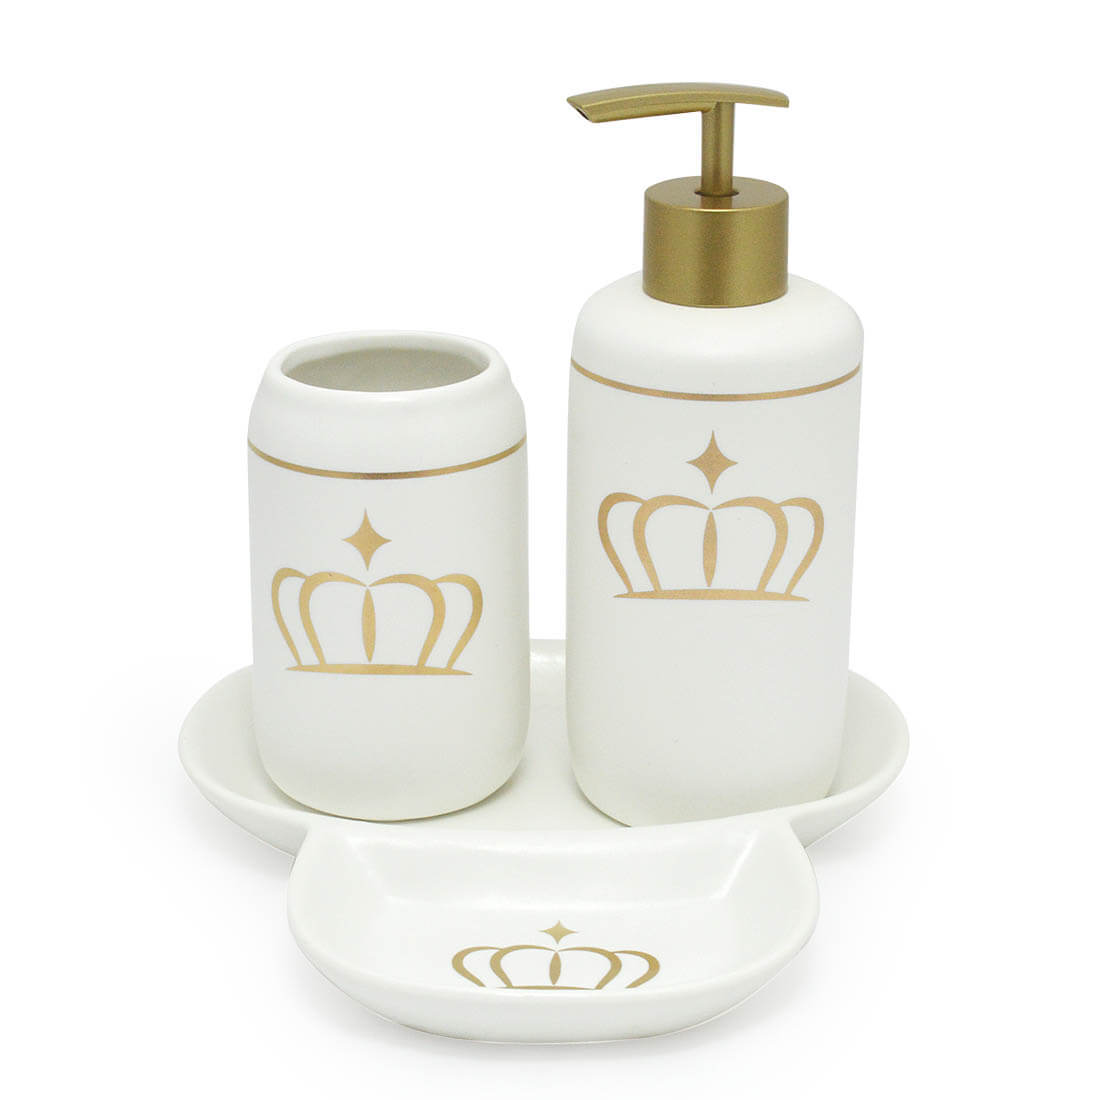 Kit Banheiro Lavabo 3 Peças Branco Porcelana Coroa Dourada